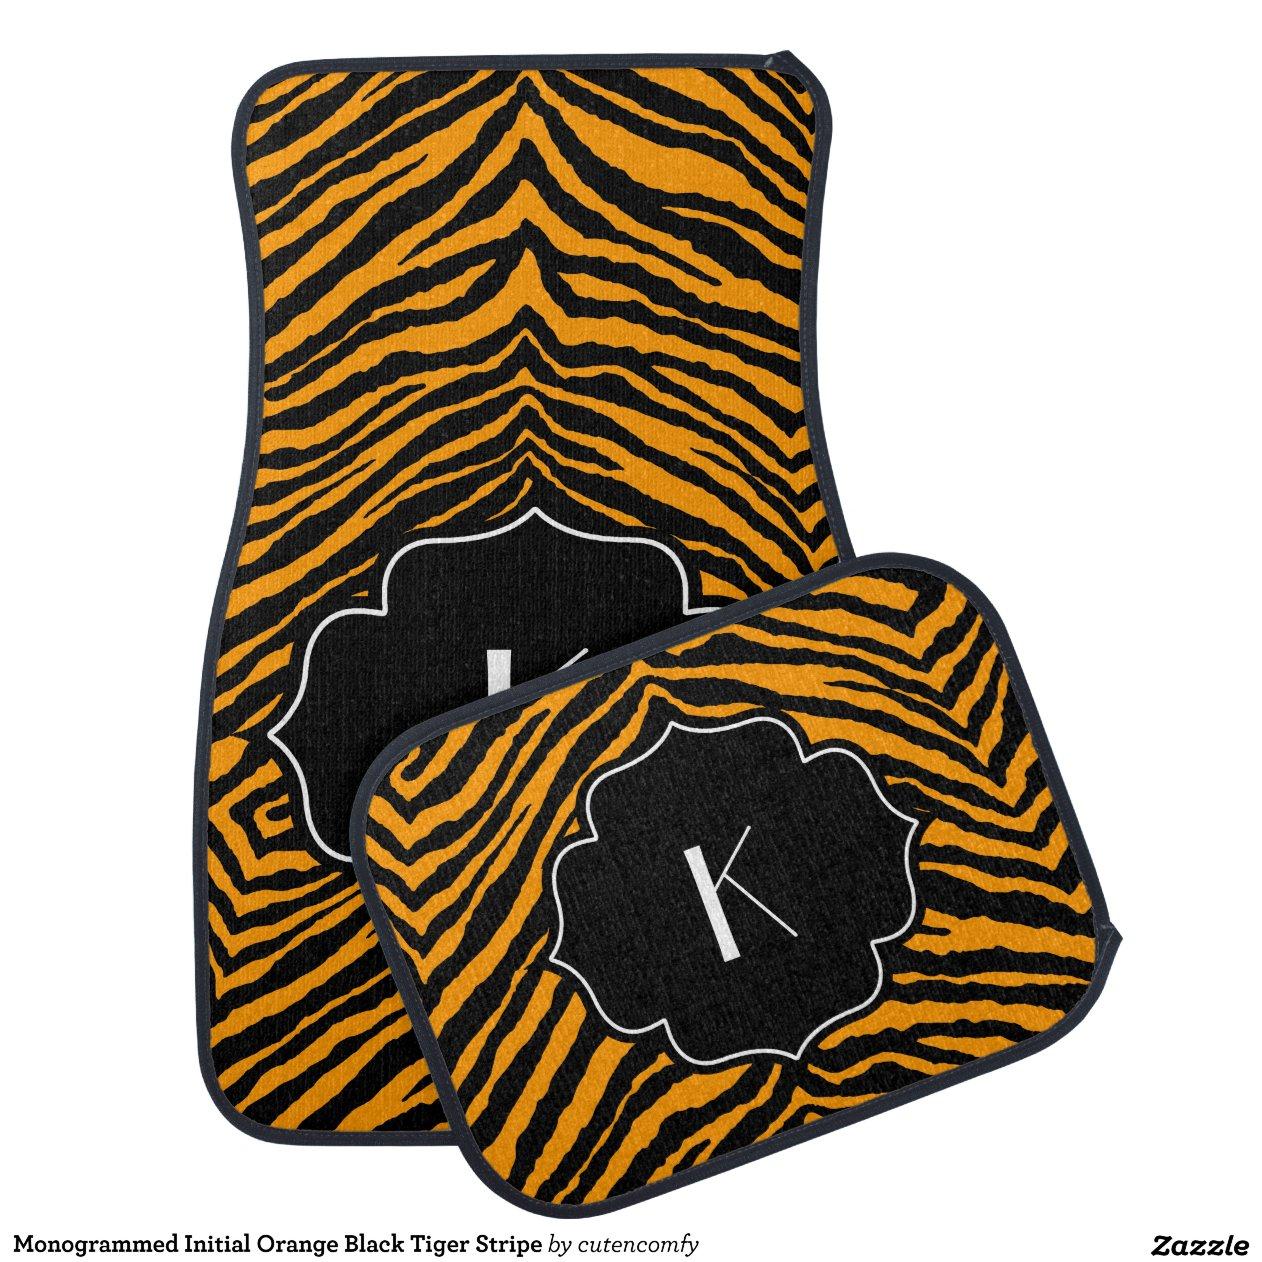 Monogrammed Initial Orange Black Tiger Stripe Floor Mat